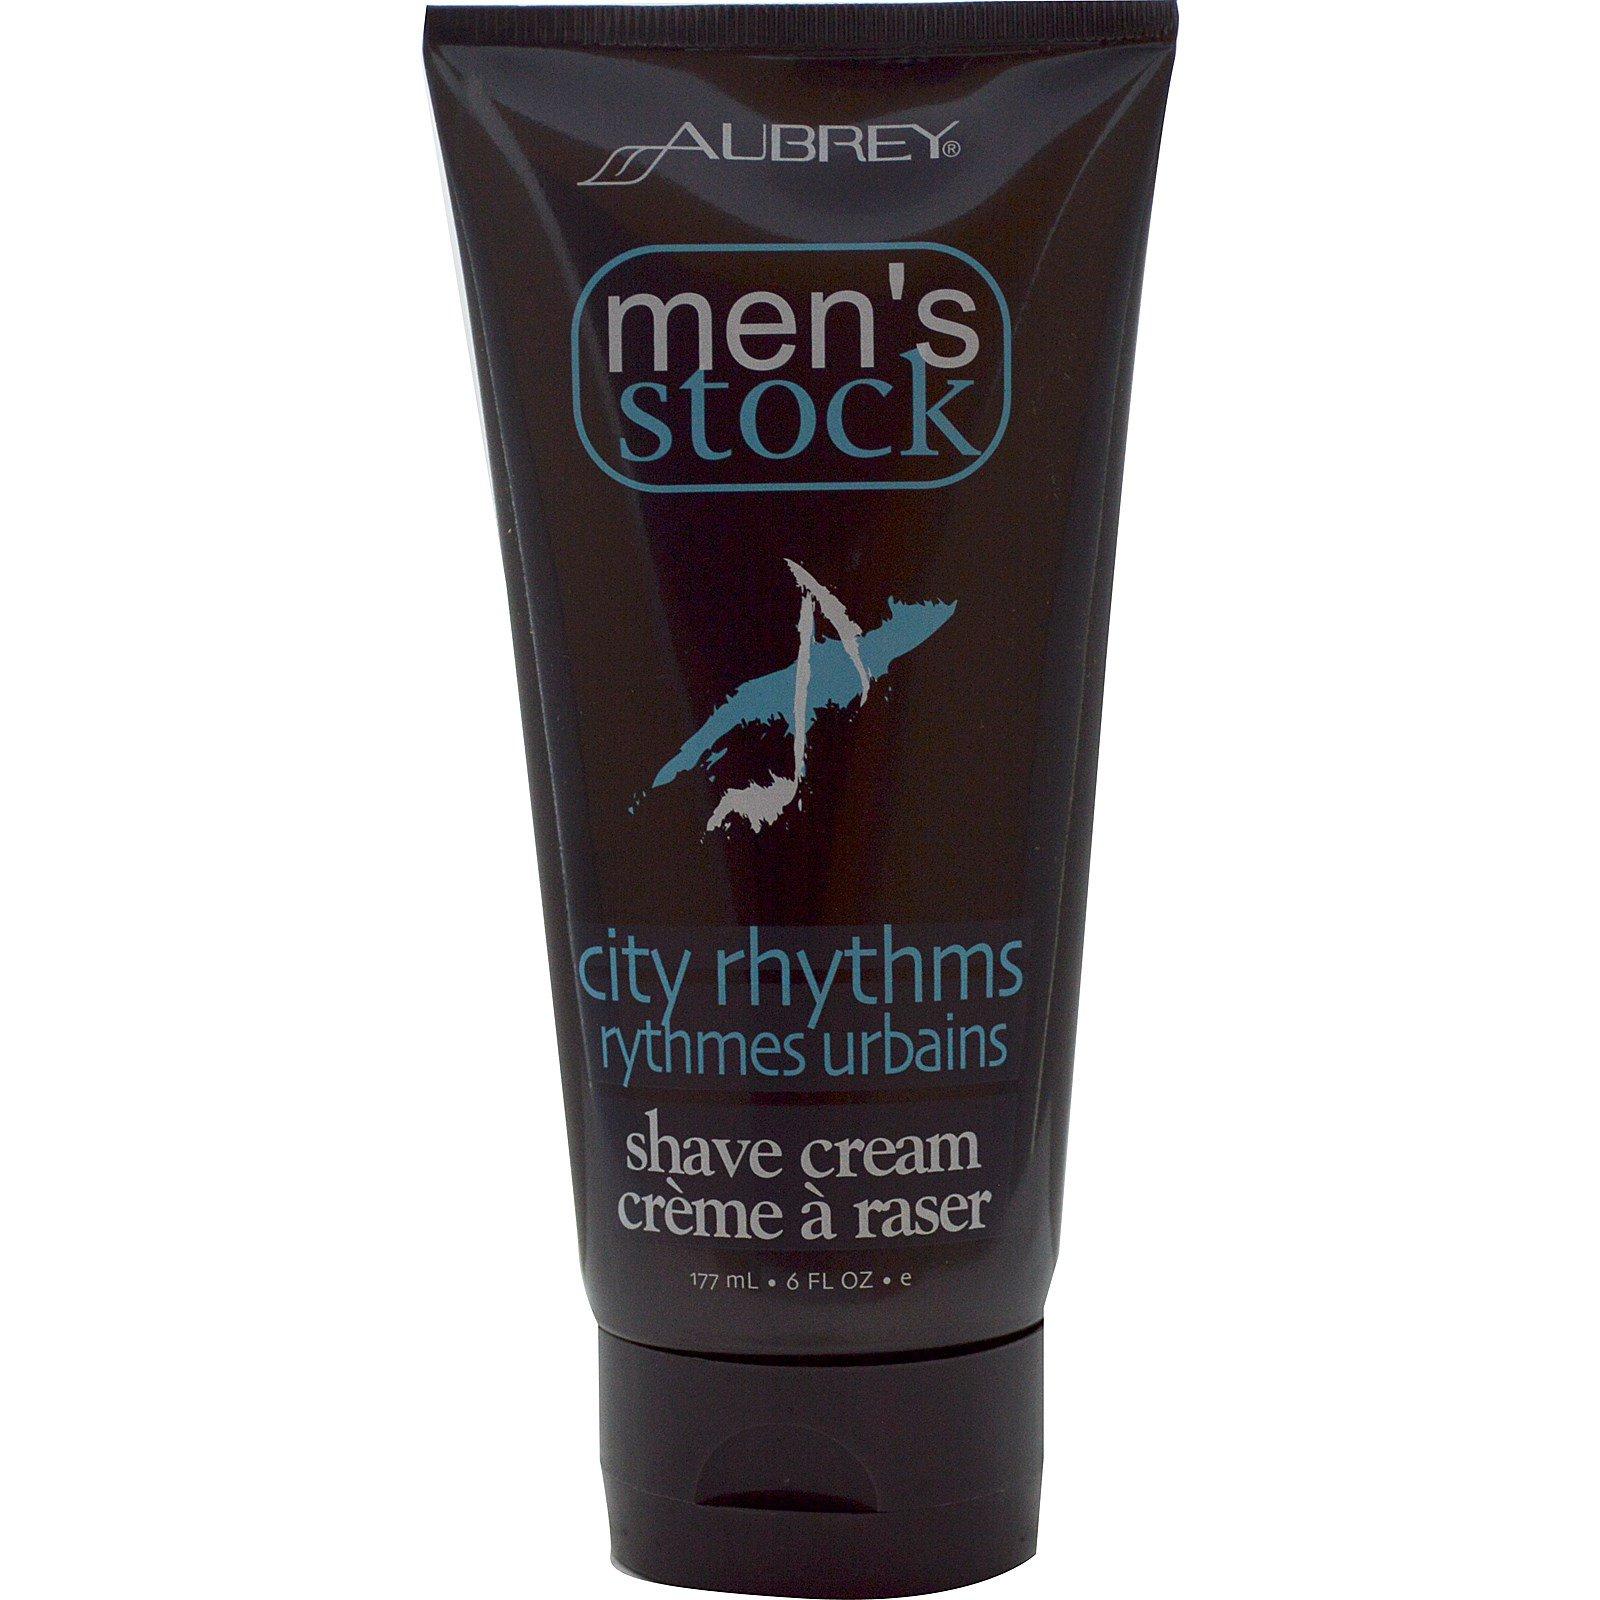 Aubrey Organics, Men's Stock, крем для бритья, City Rhythms, 177 мл